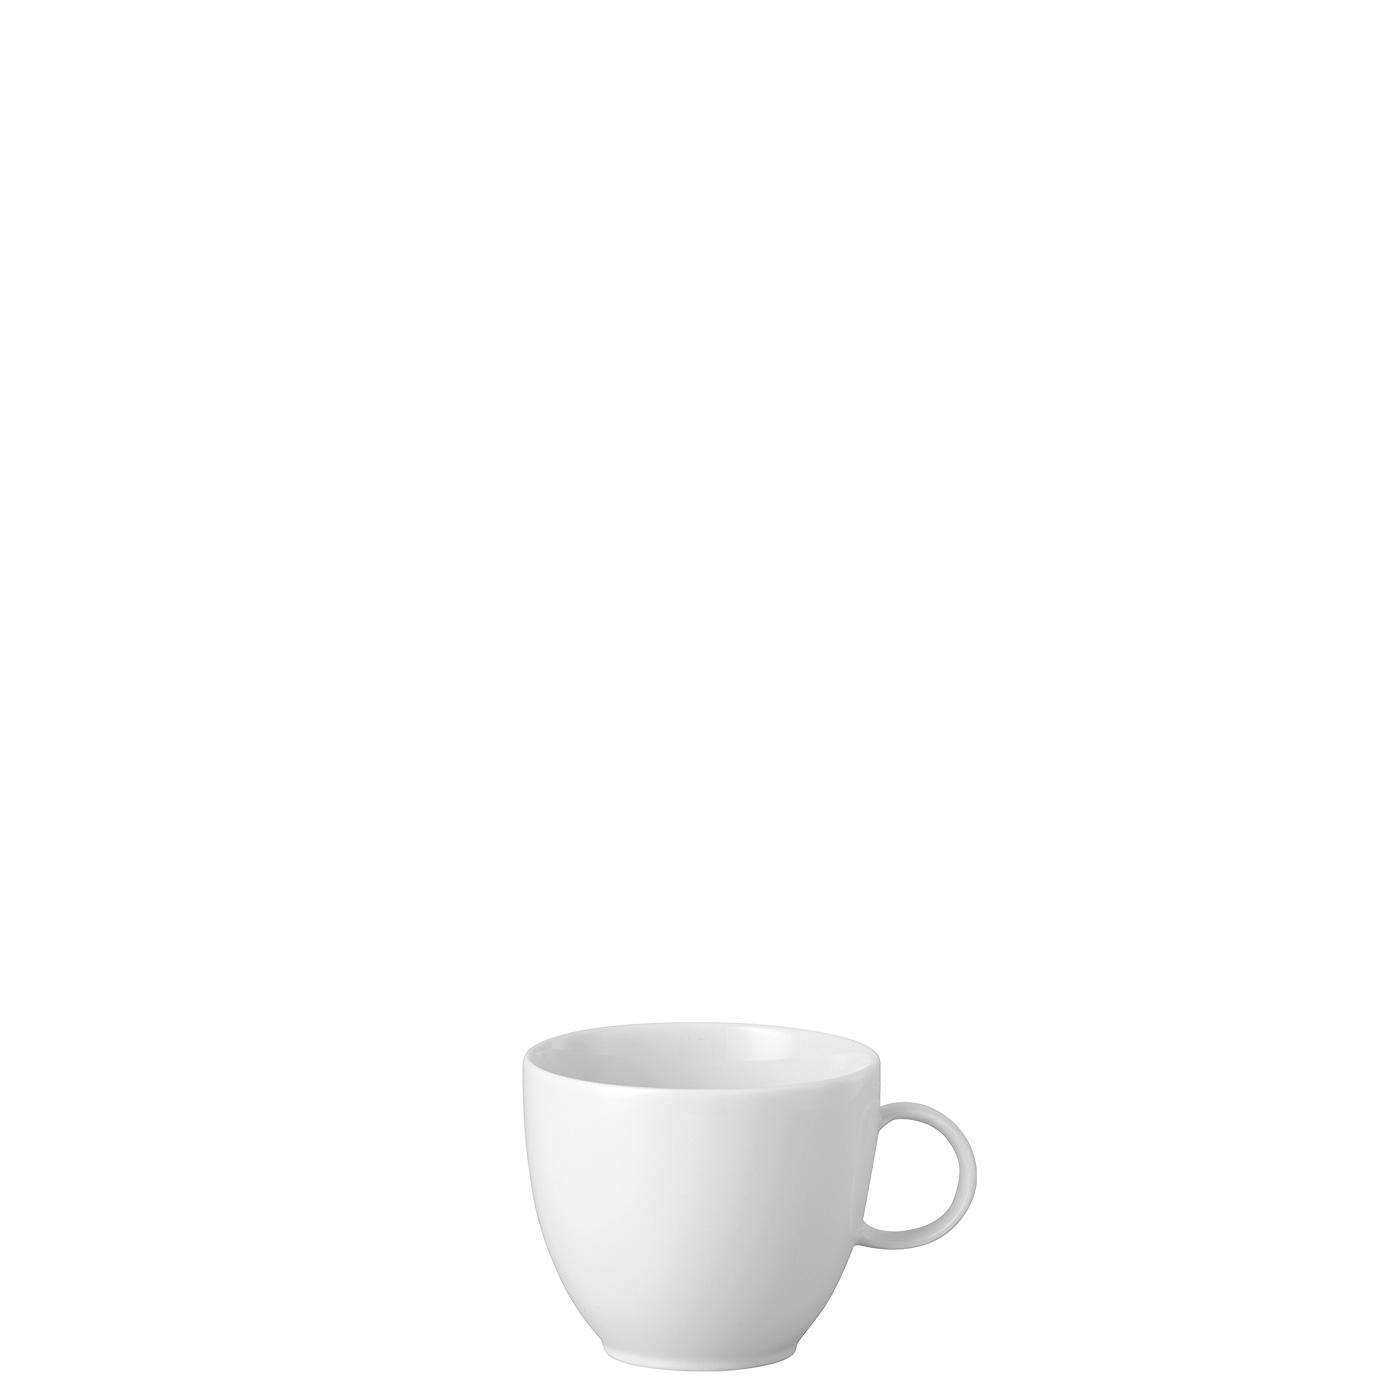 Kaffee-Obertasse Sunny Day Weiss Thomas Porzellan